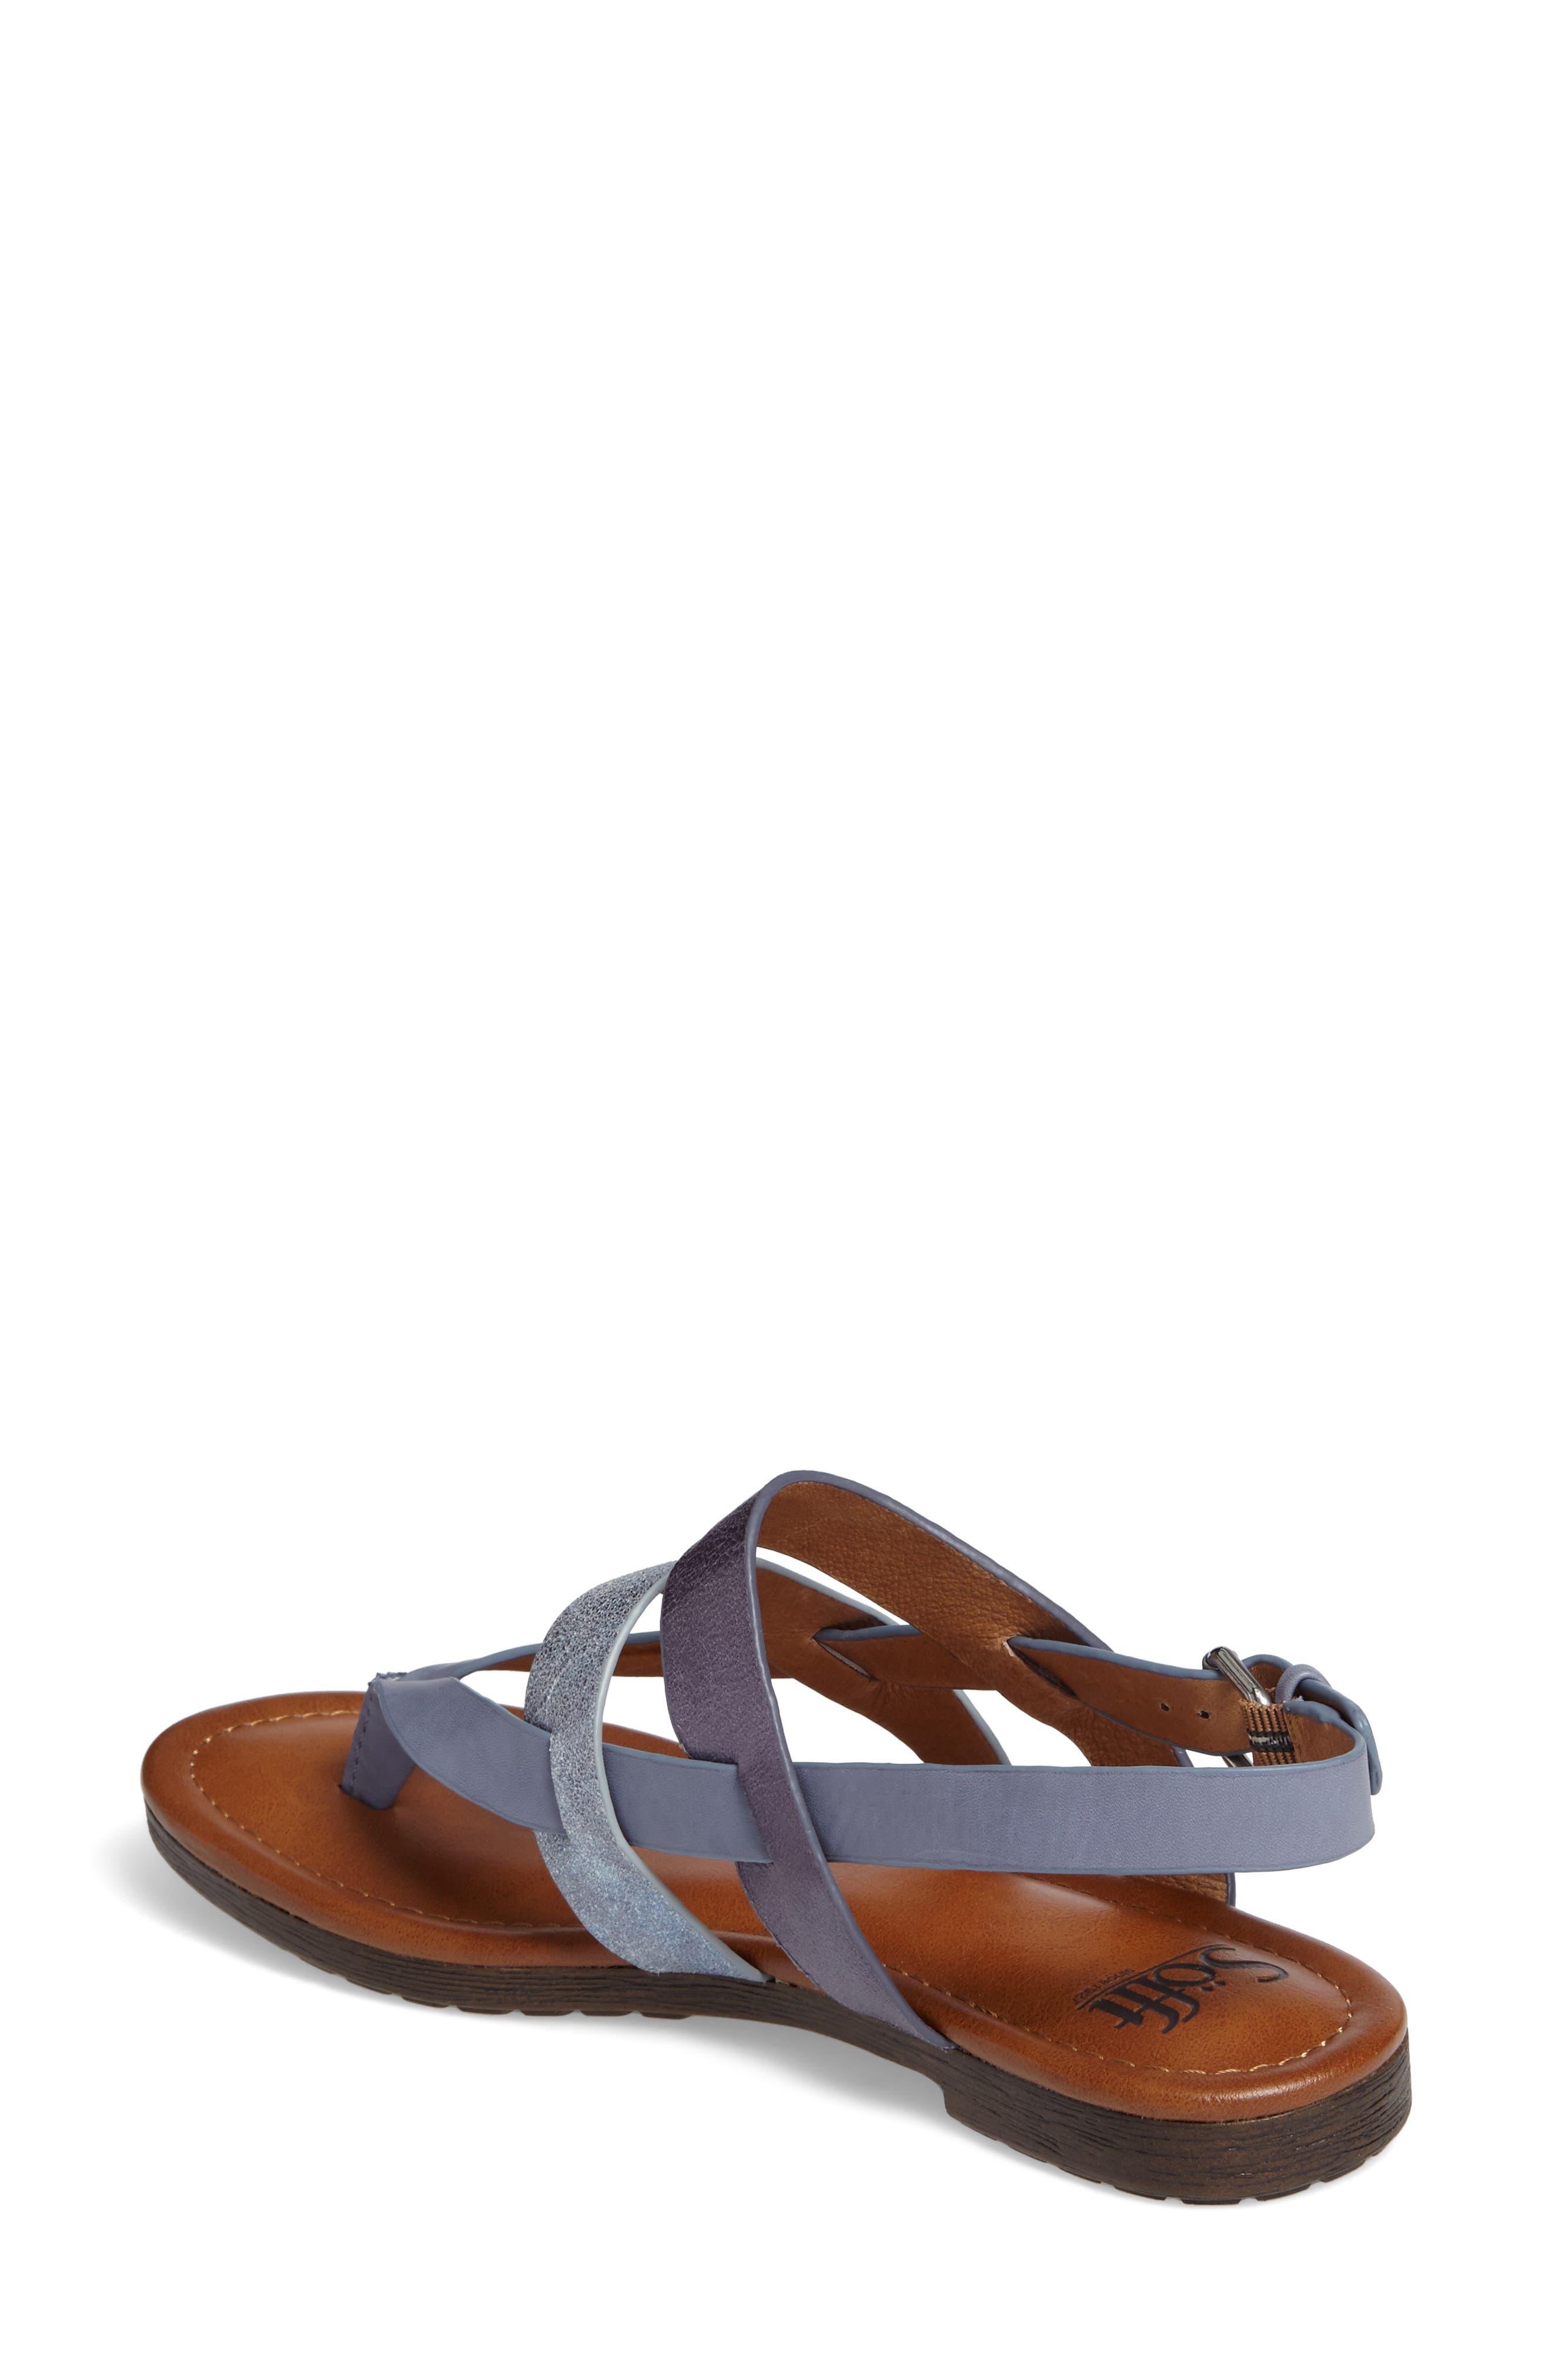 Bena Strappy Sandal,                             Alternate thumbnail 2, color,                             Denim/ Blue/ Pale Blue Leather